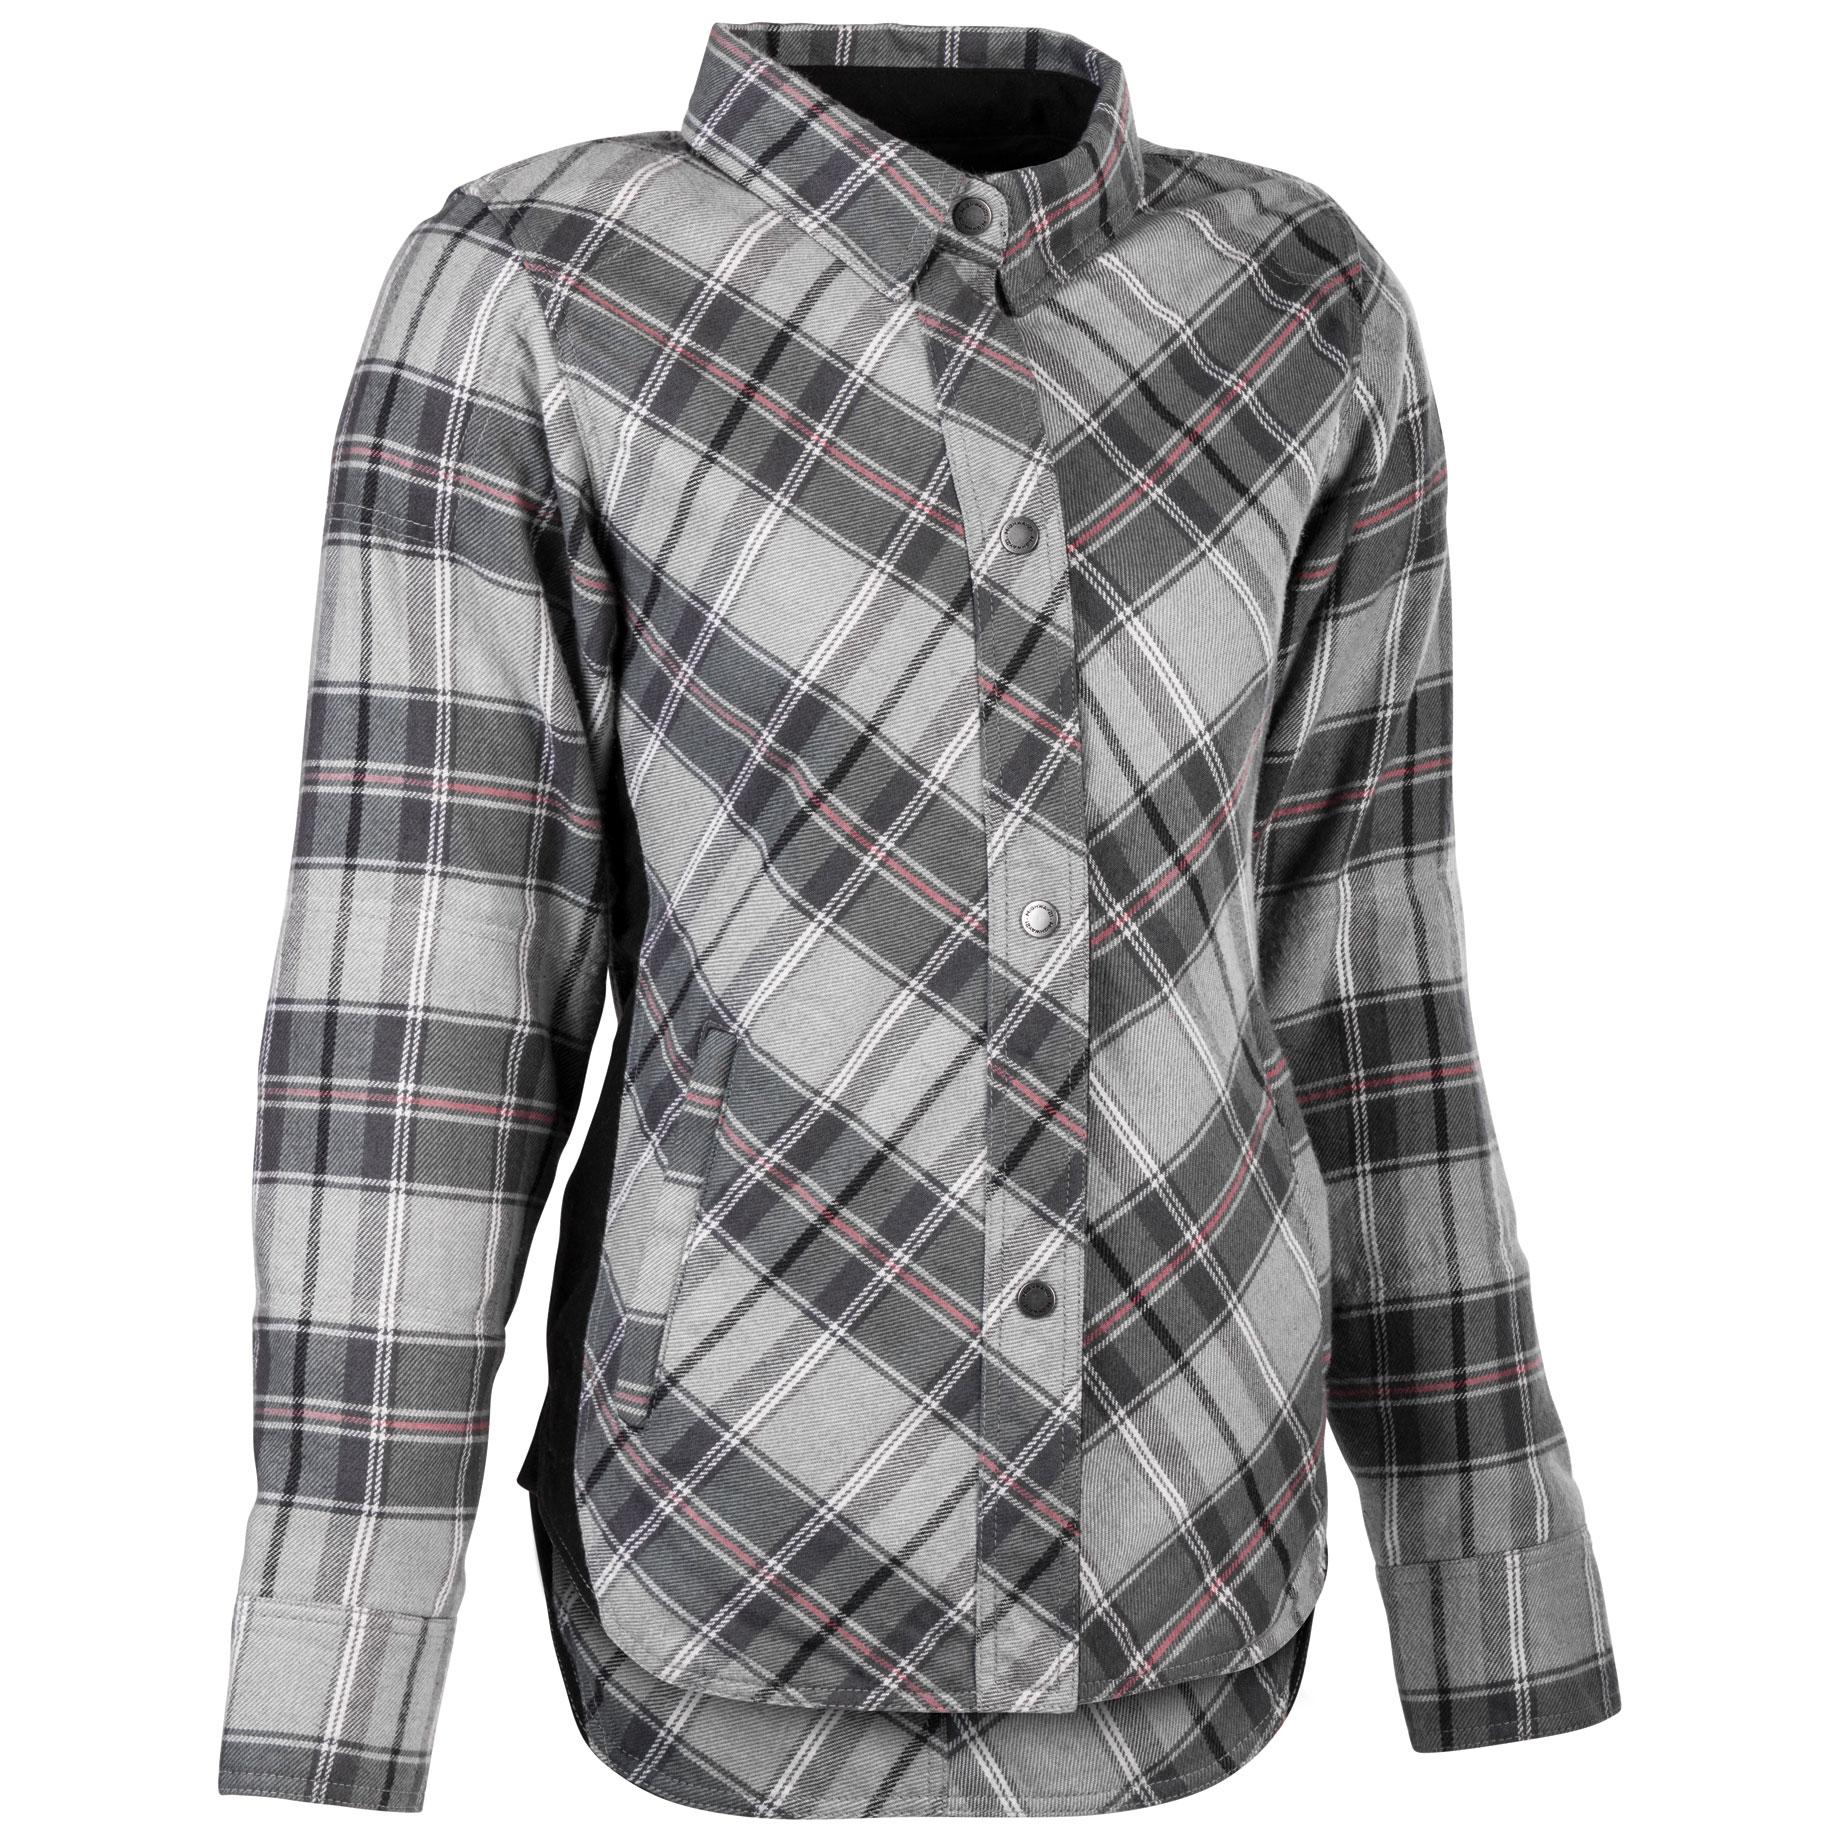 Highway 21 Women's Rogue Pink/Gray Flannel Jacket